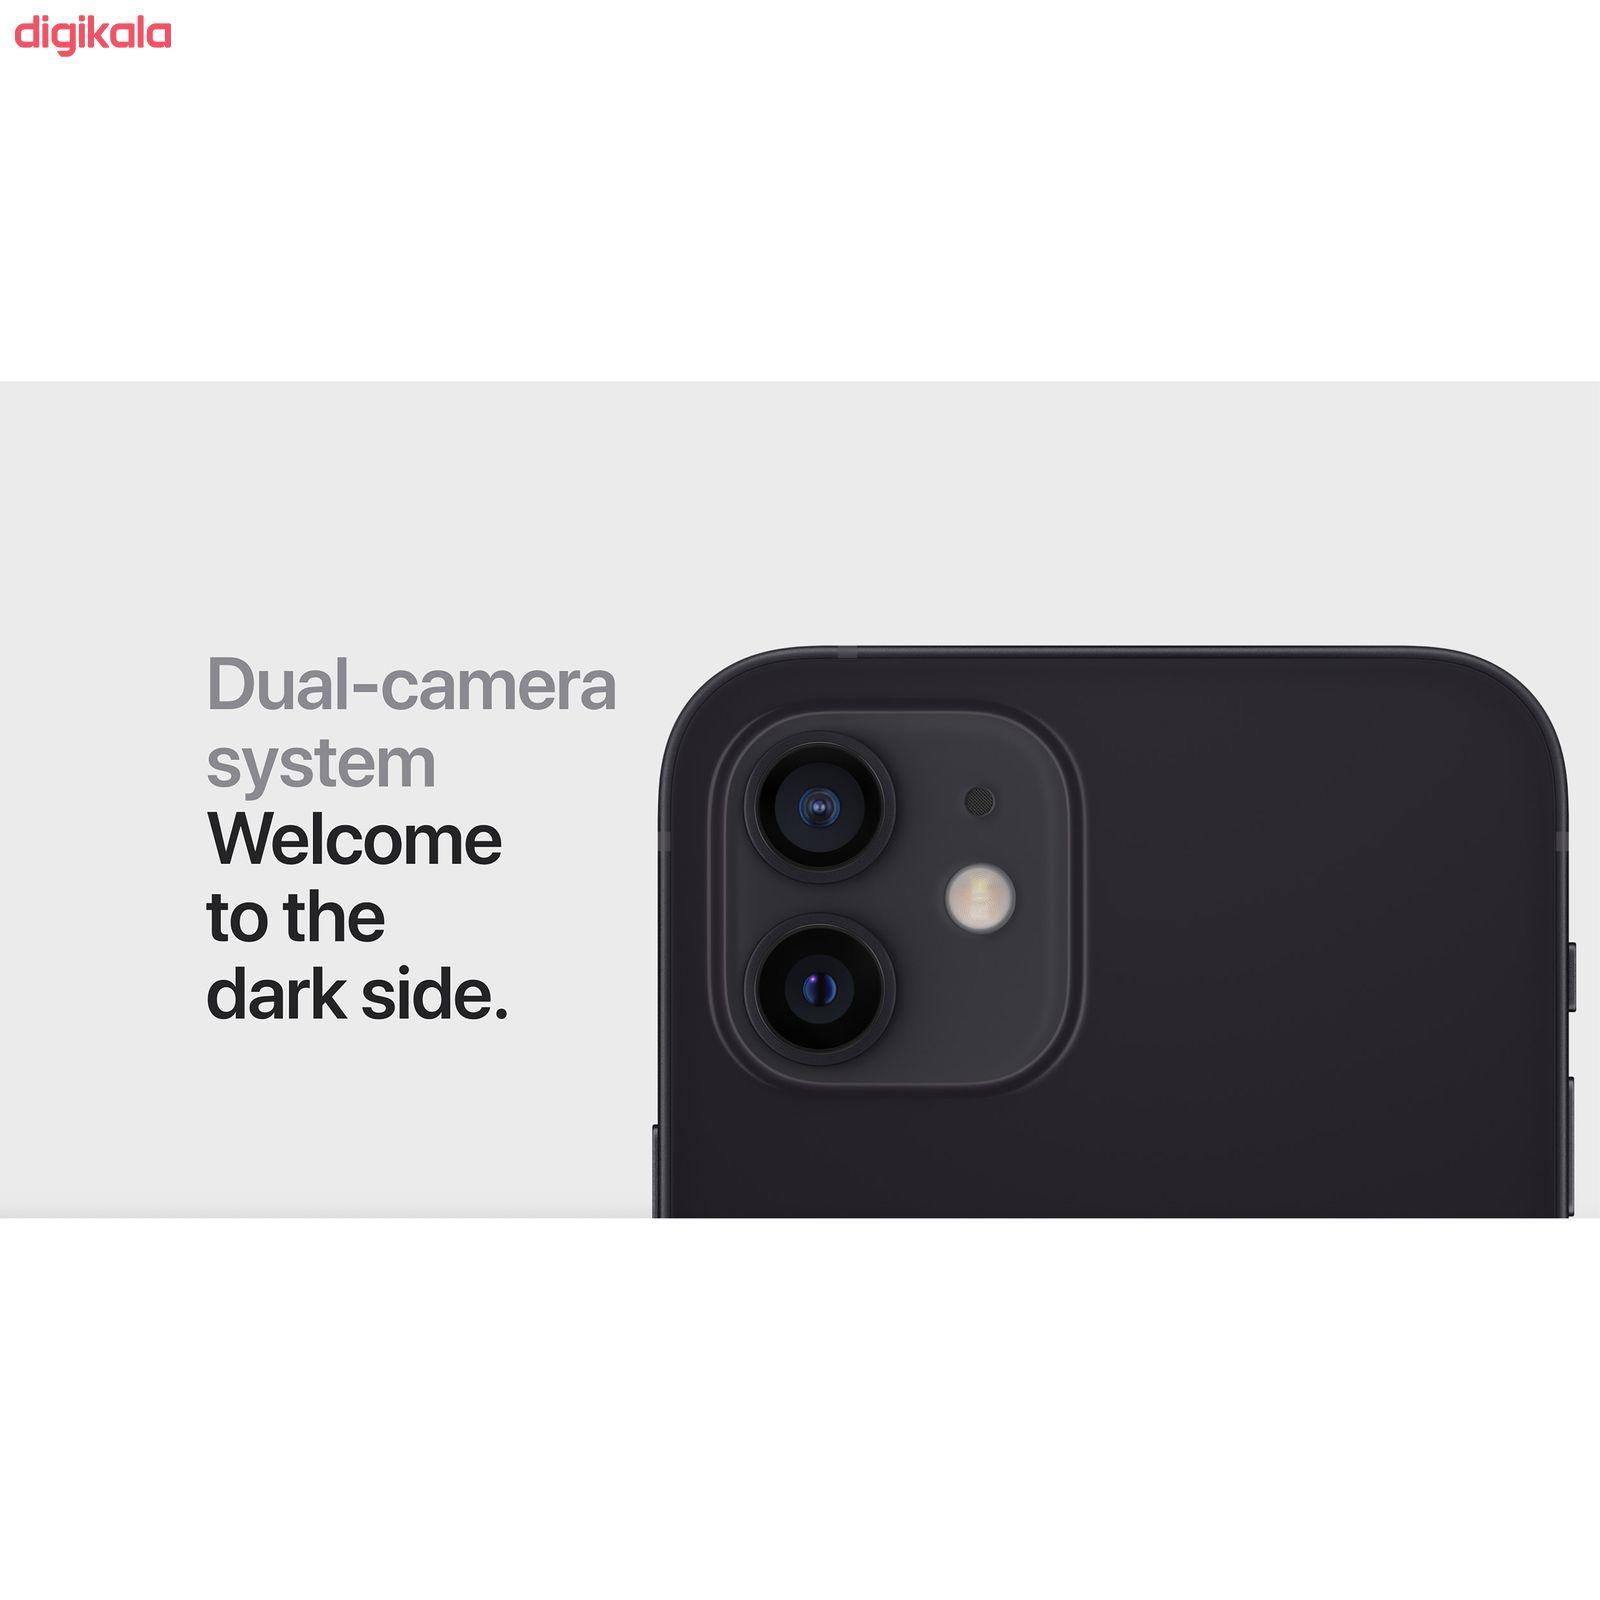 گوشی موبایل اپل مدل iPhone 12 A2404 دو سیم کارت ظرفیت 128 گیگابایت  main 1 4